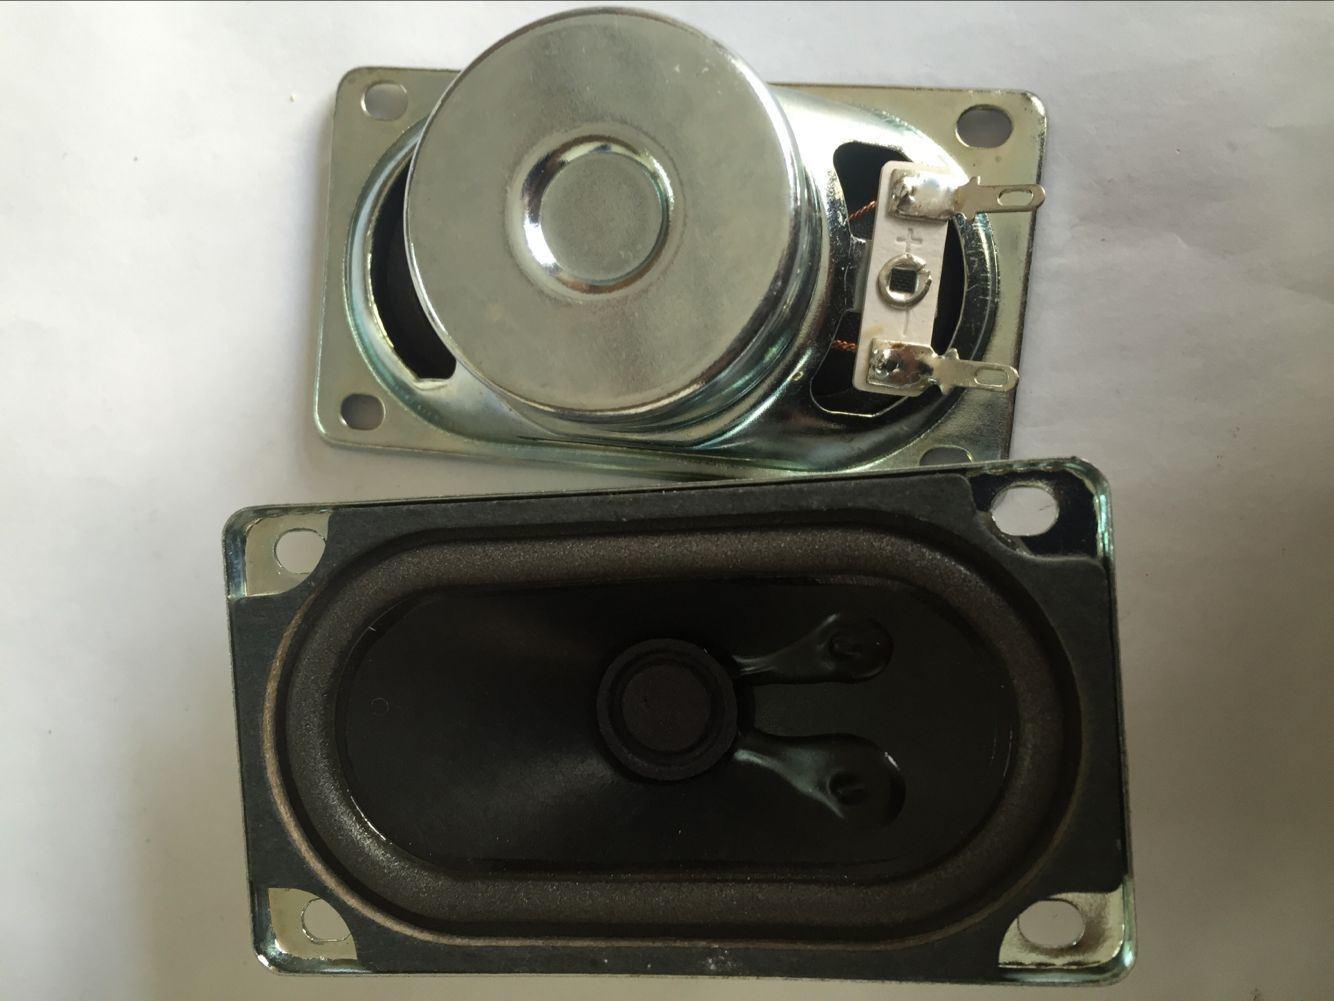 Square Speaker Use for TV or Desktop Audio